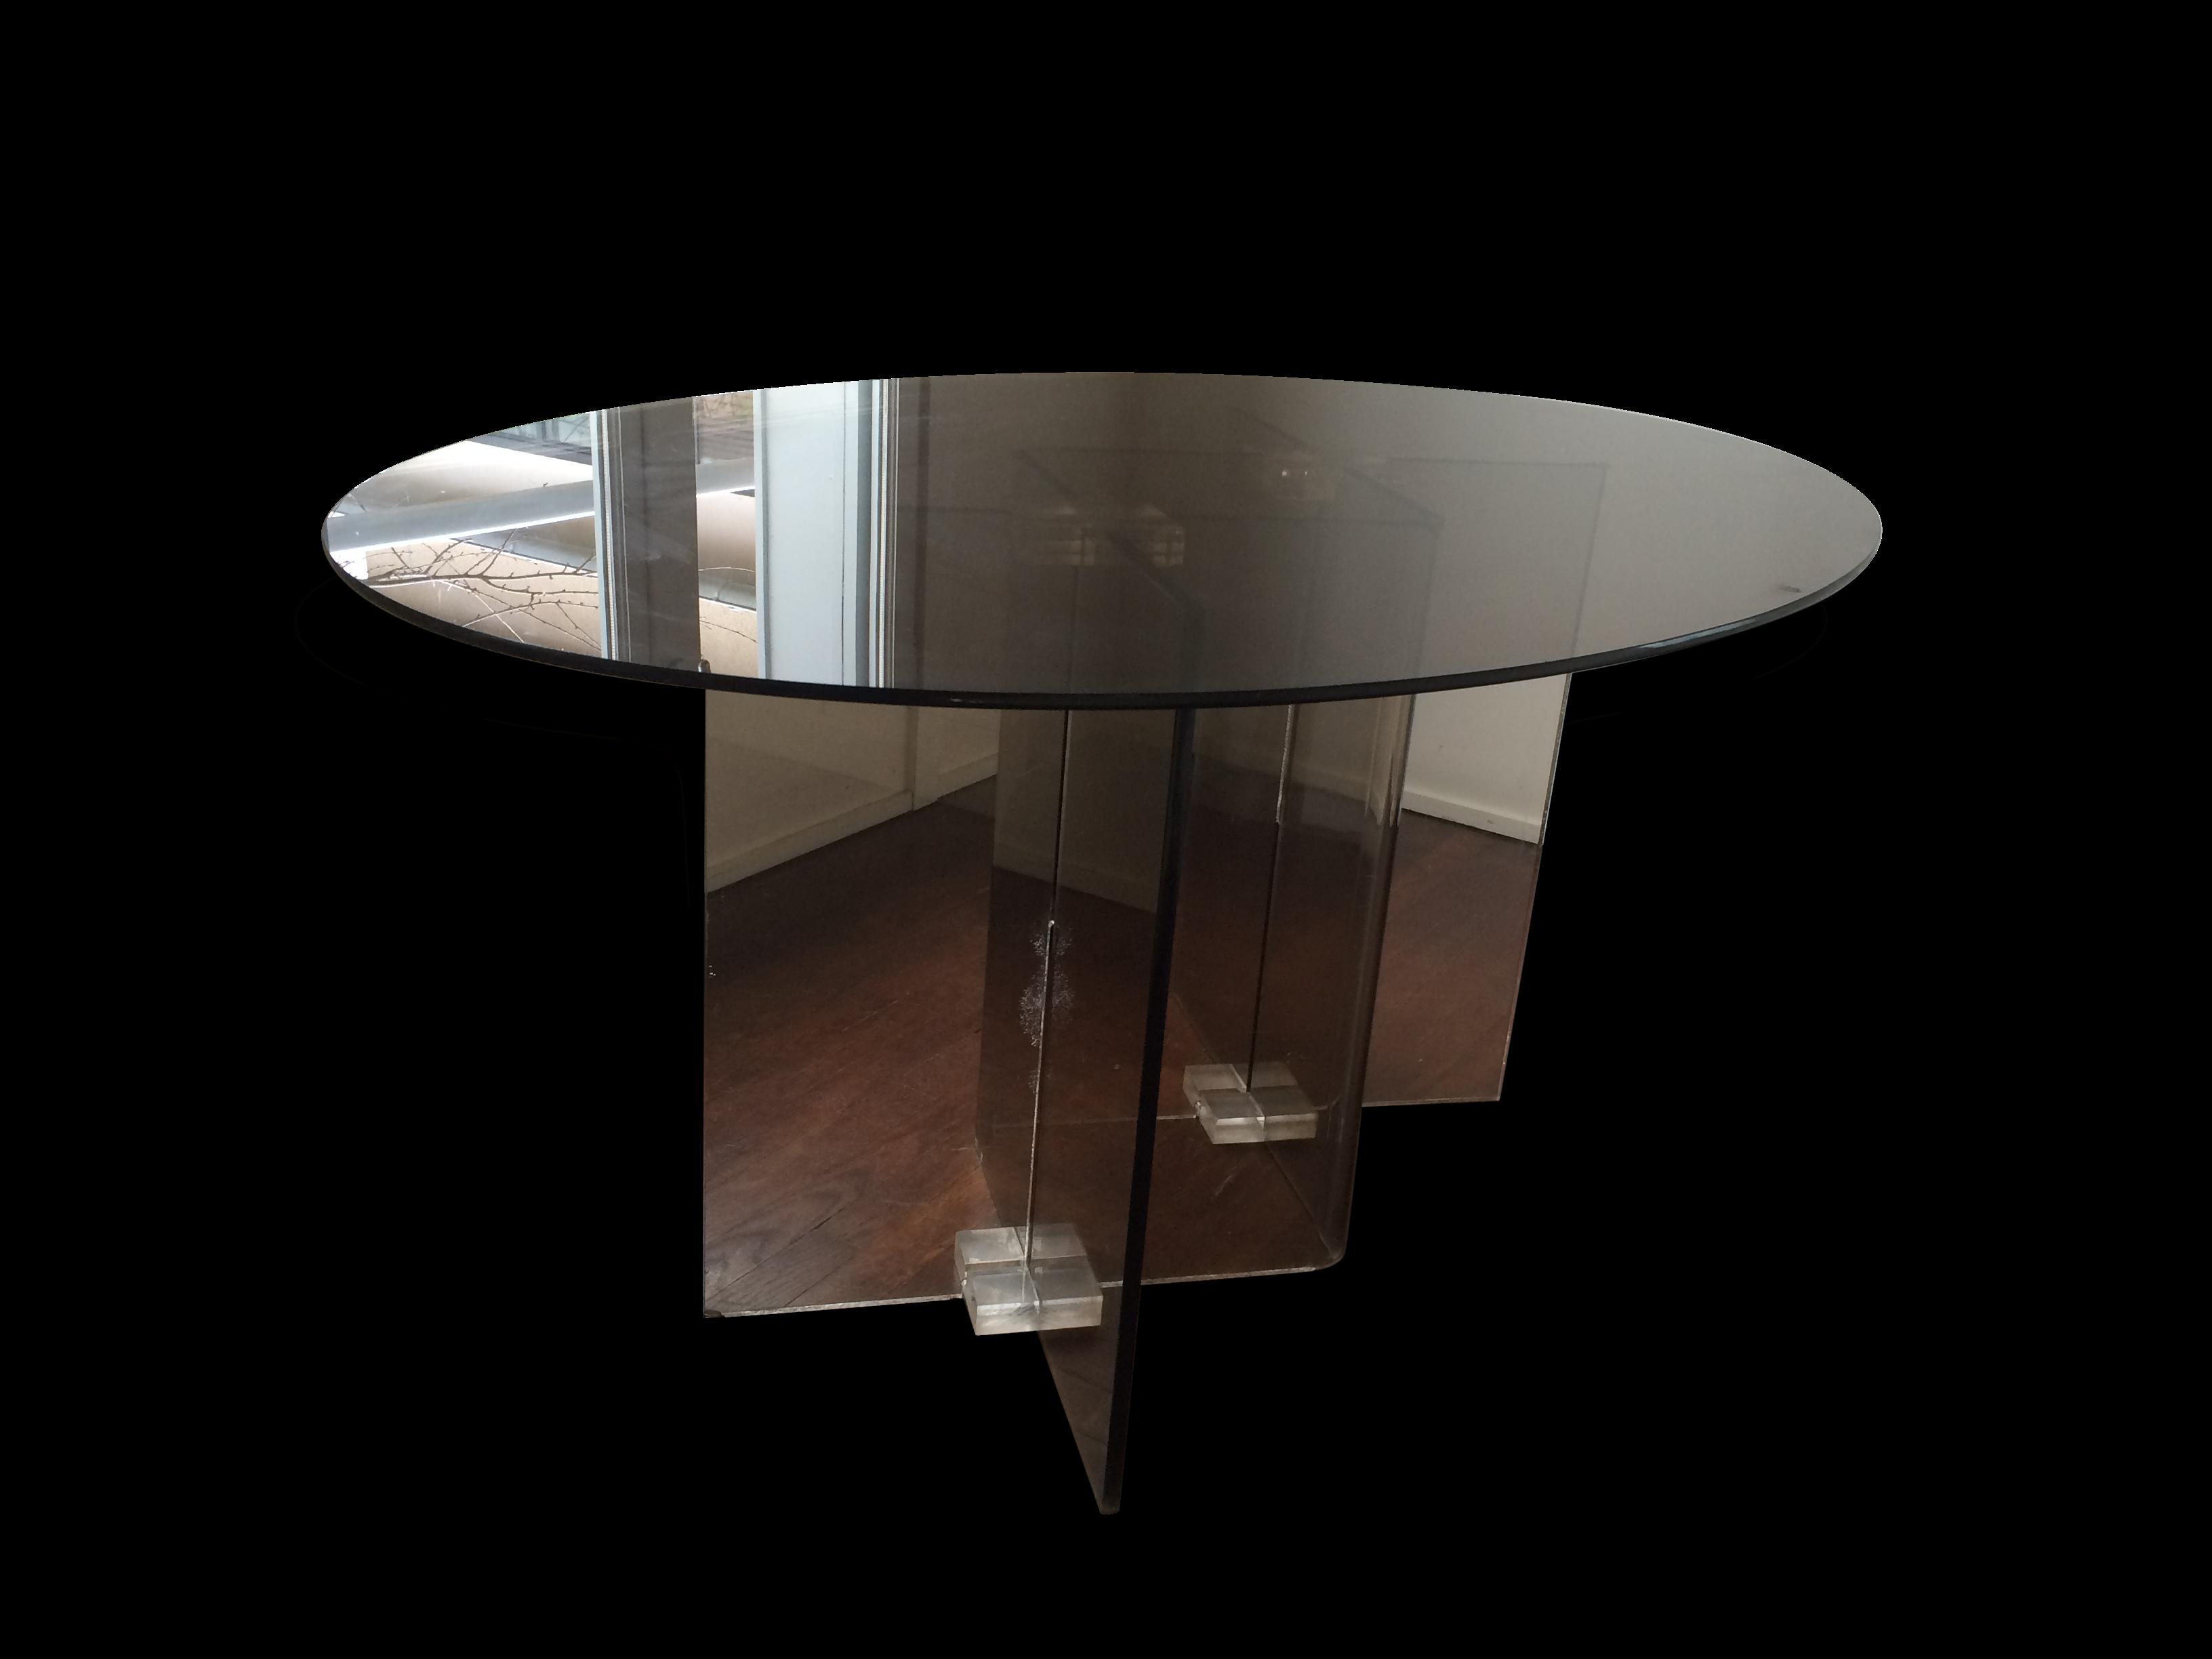 table ronde roche bobois table repas roche bobois gamme tnr with table ronde roche bobois. Black Bedroom Furniture Sets. Home Design Ideas